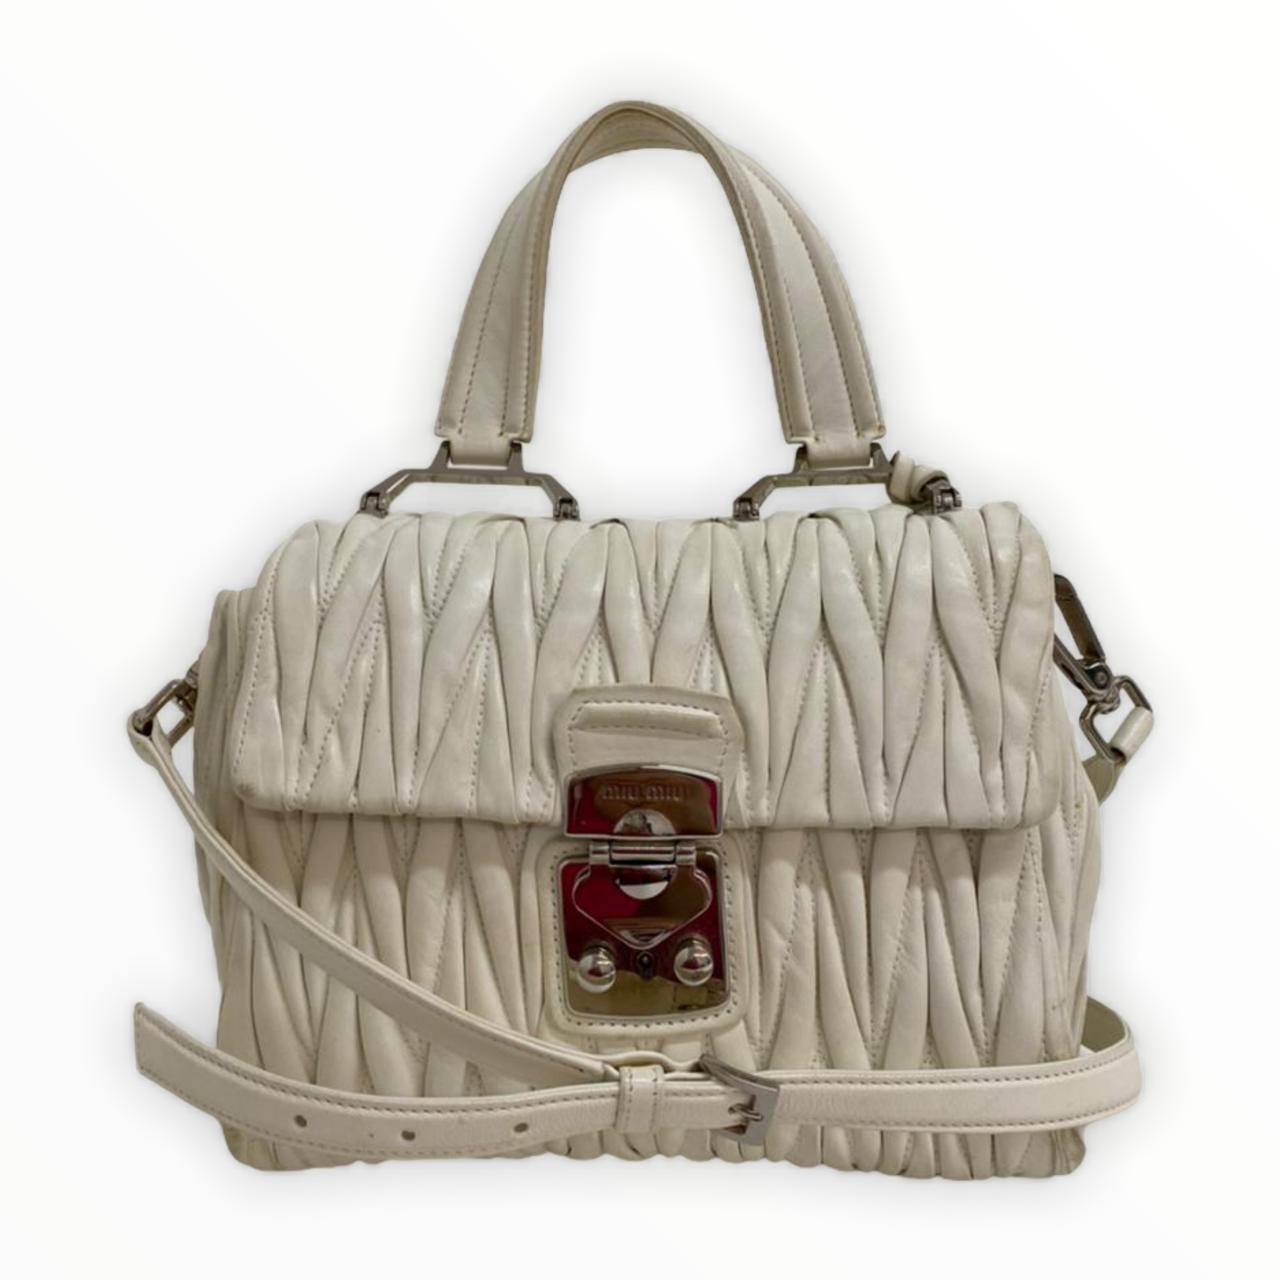 Bolsa Miu Miu Top Handle Matelassé Off-White